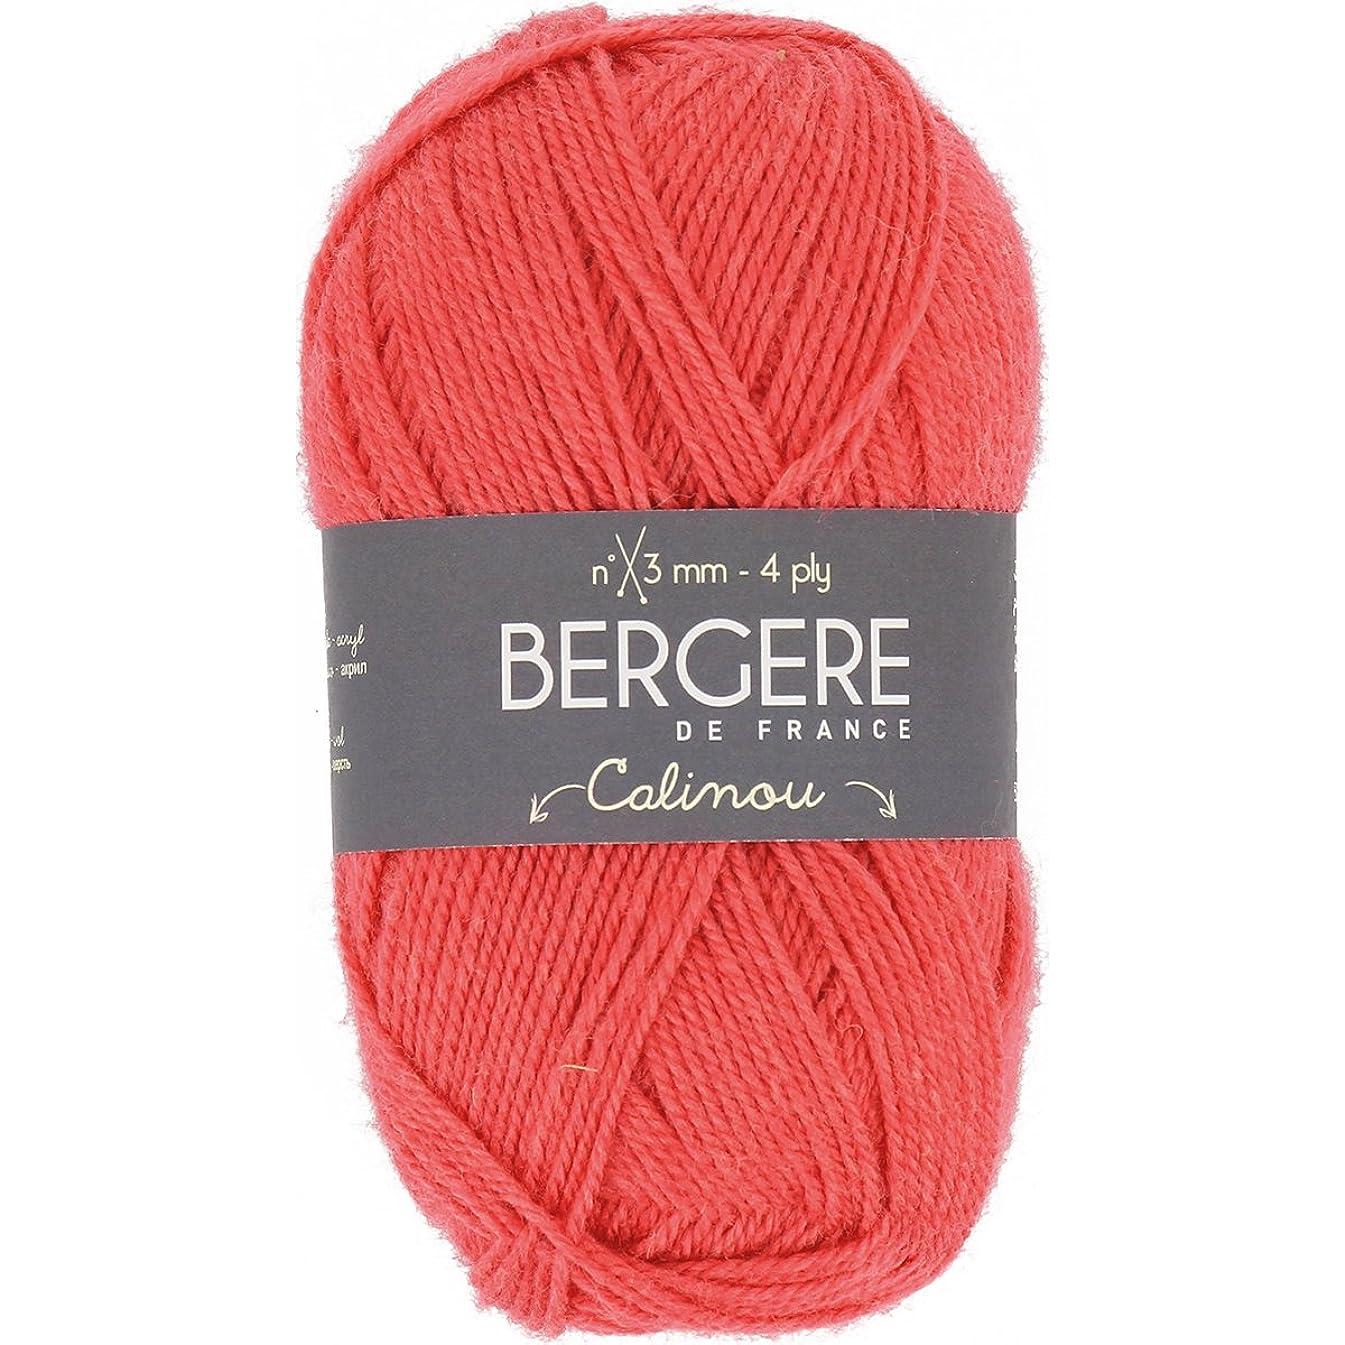 Bergere de France 10051 Calinou Yarn-Begonia